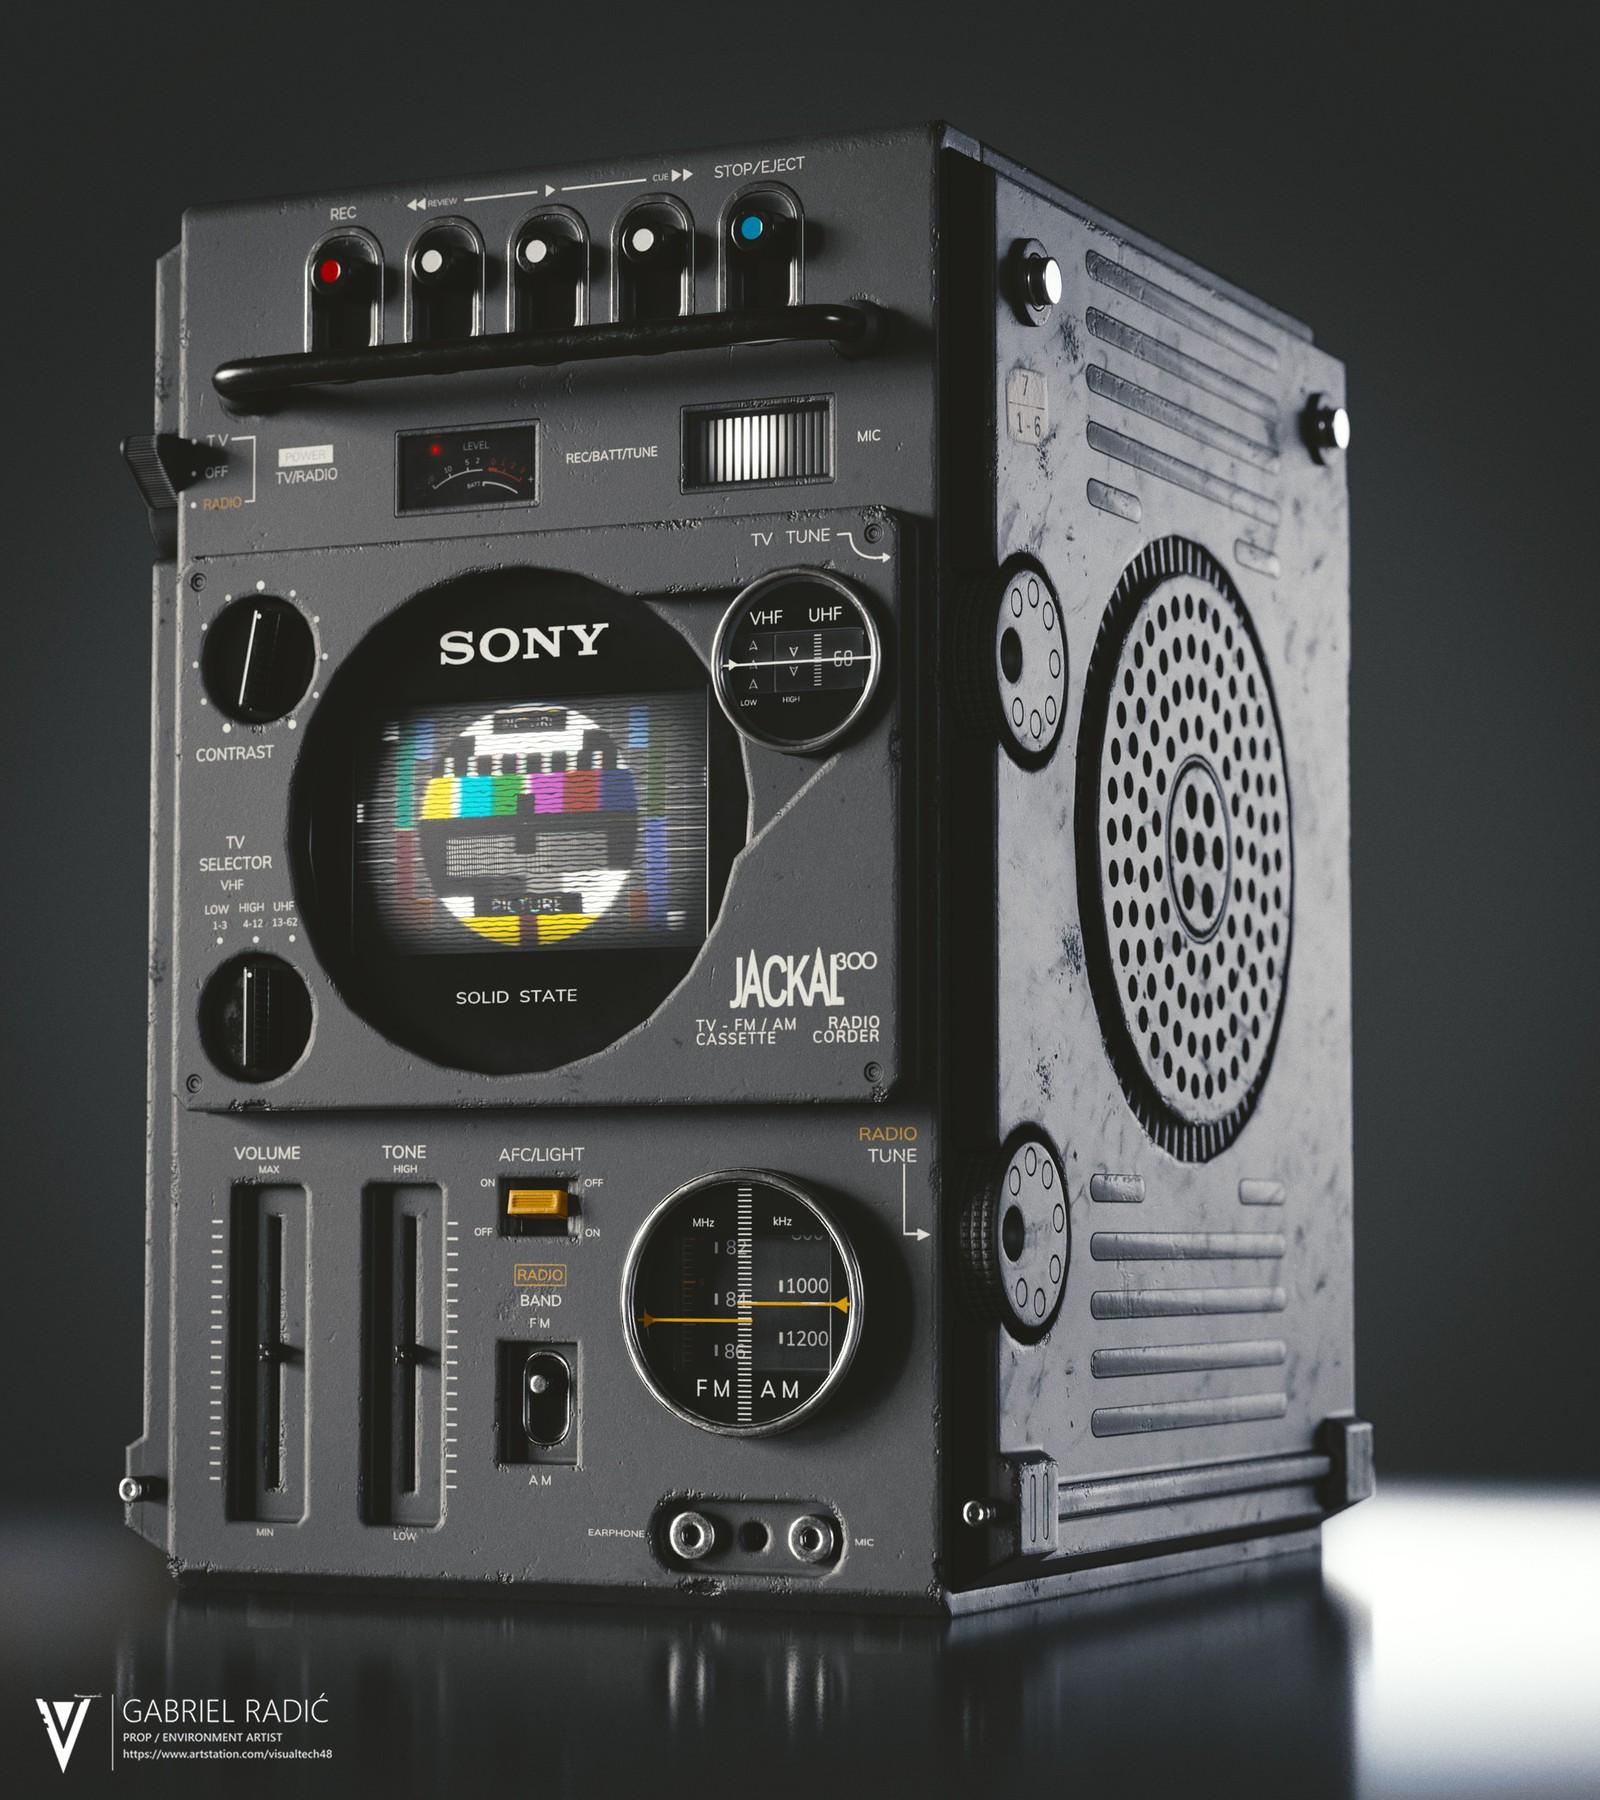 Sony Jackal 300